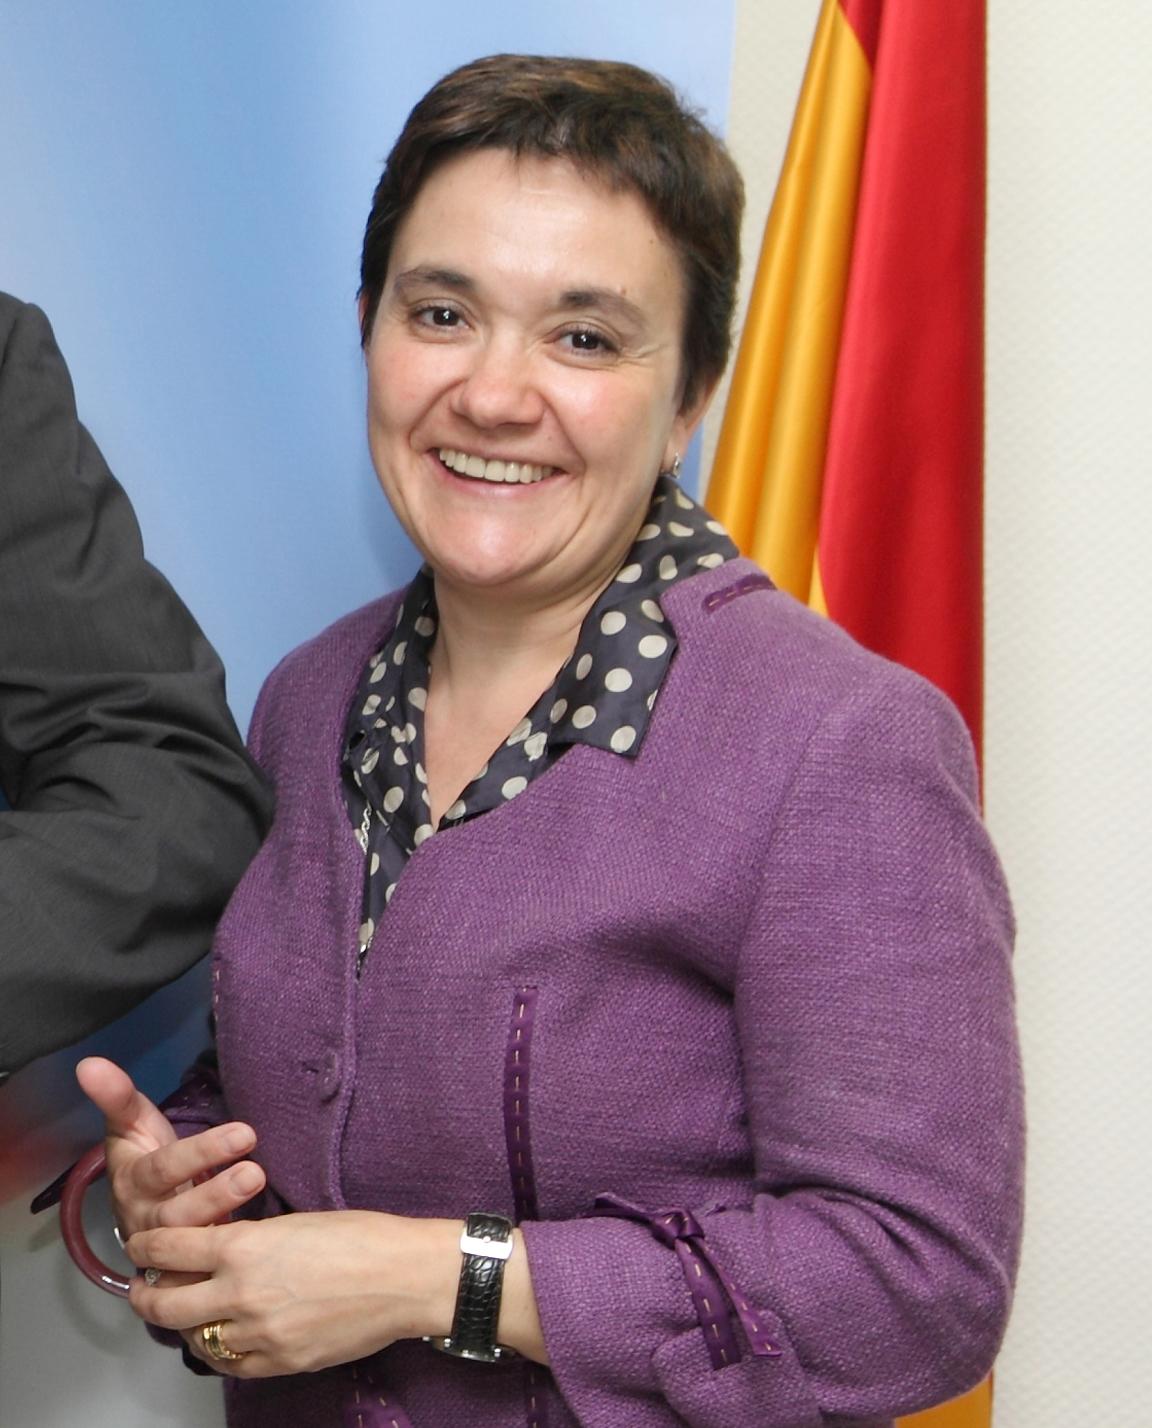 maria-jesus-perez_AEDIPE Encuentros Digitales: Entrevista a Mª Jesús Pérez, Secretaria General de AEDIPE